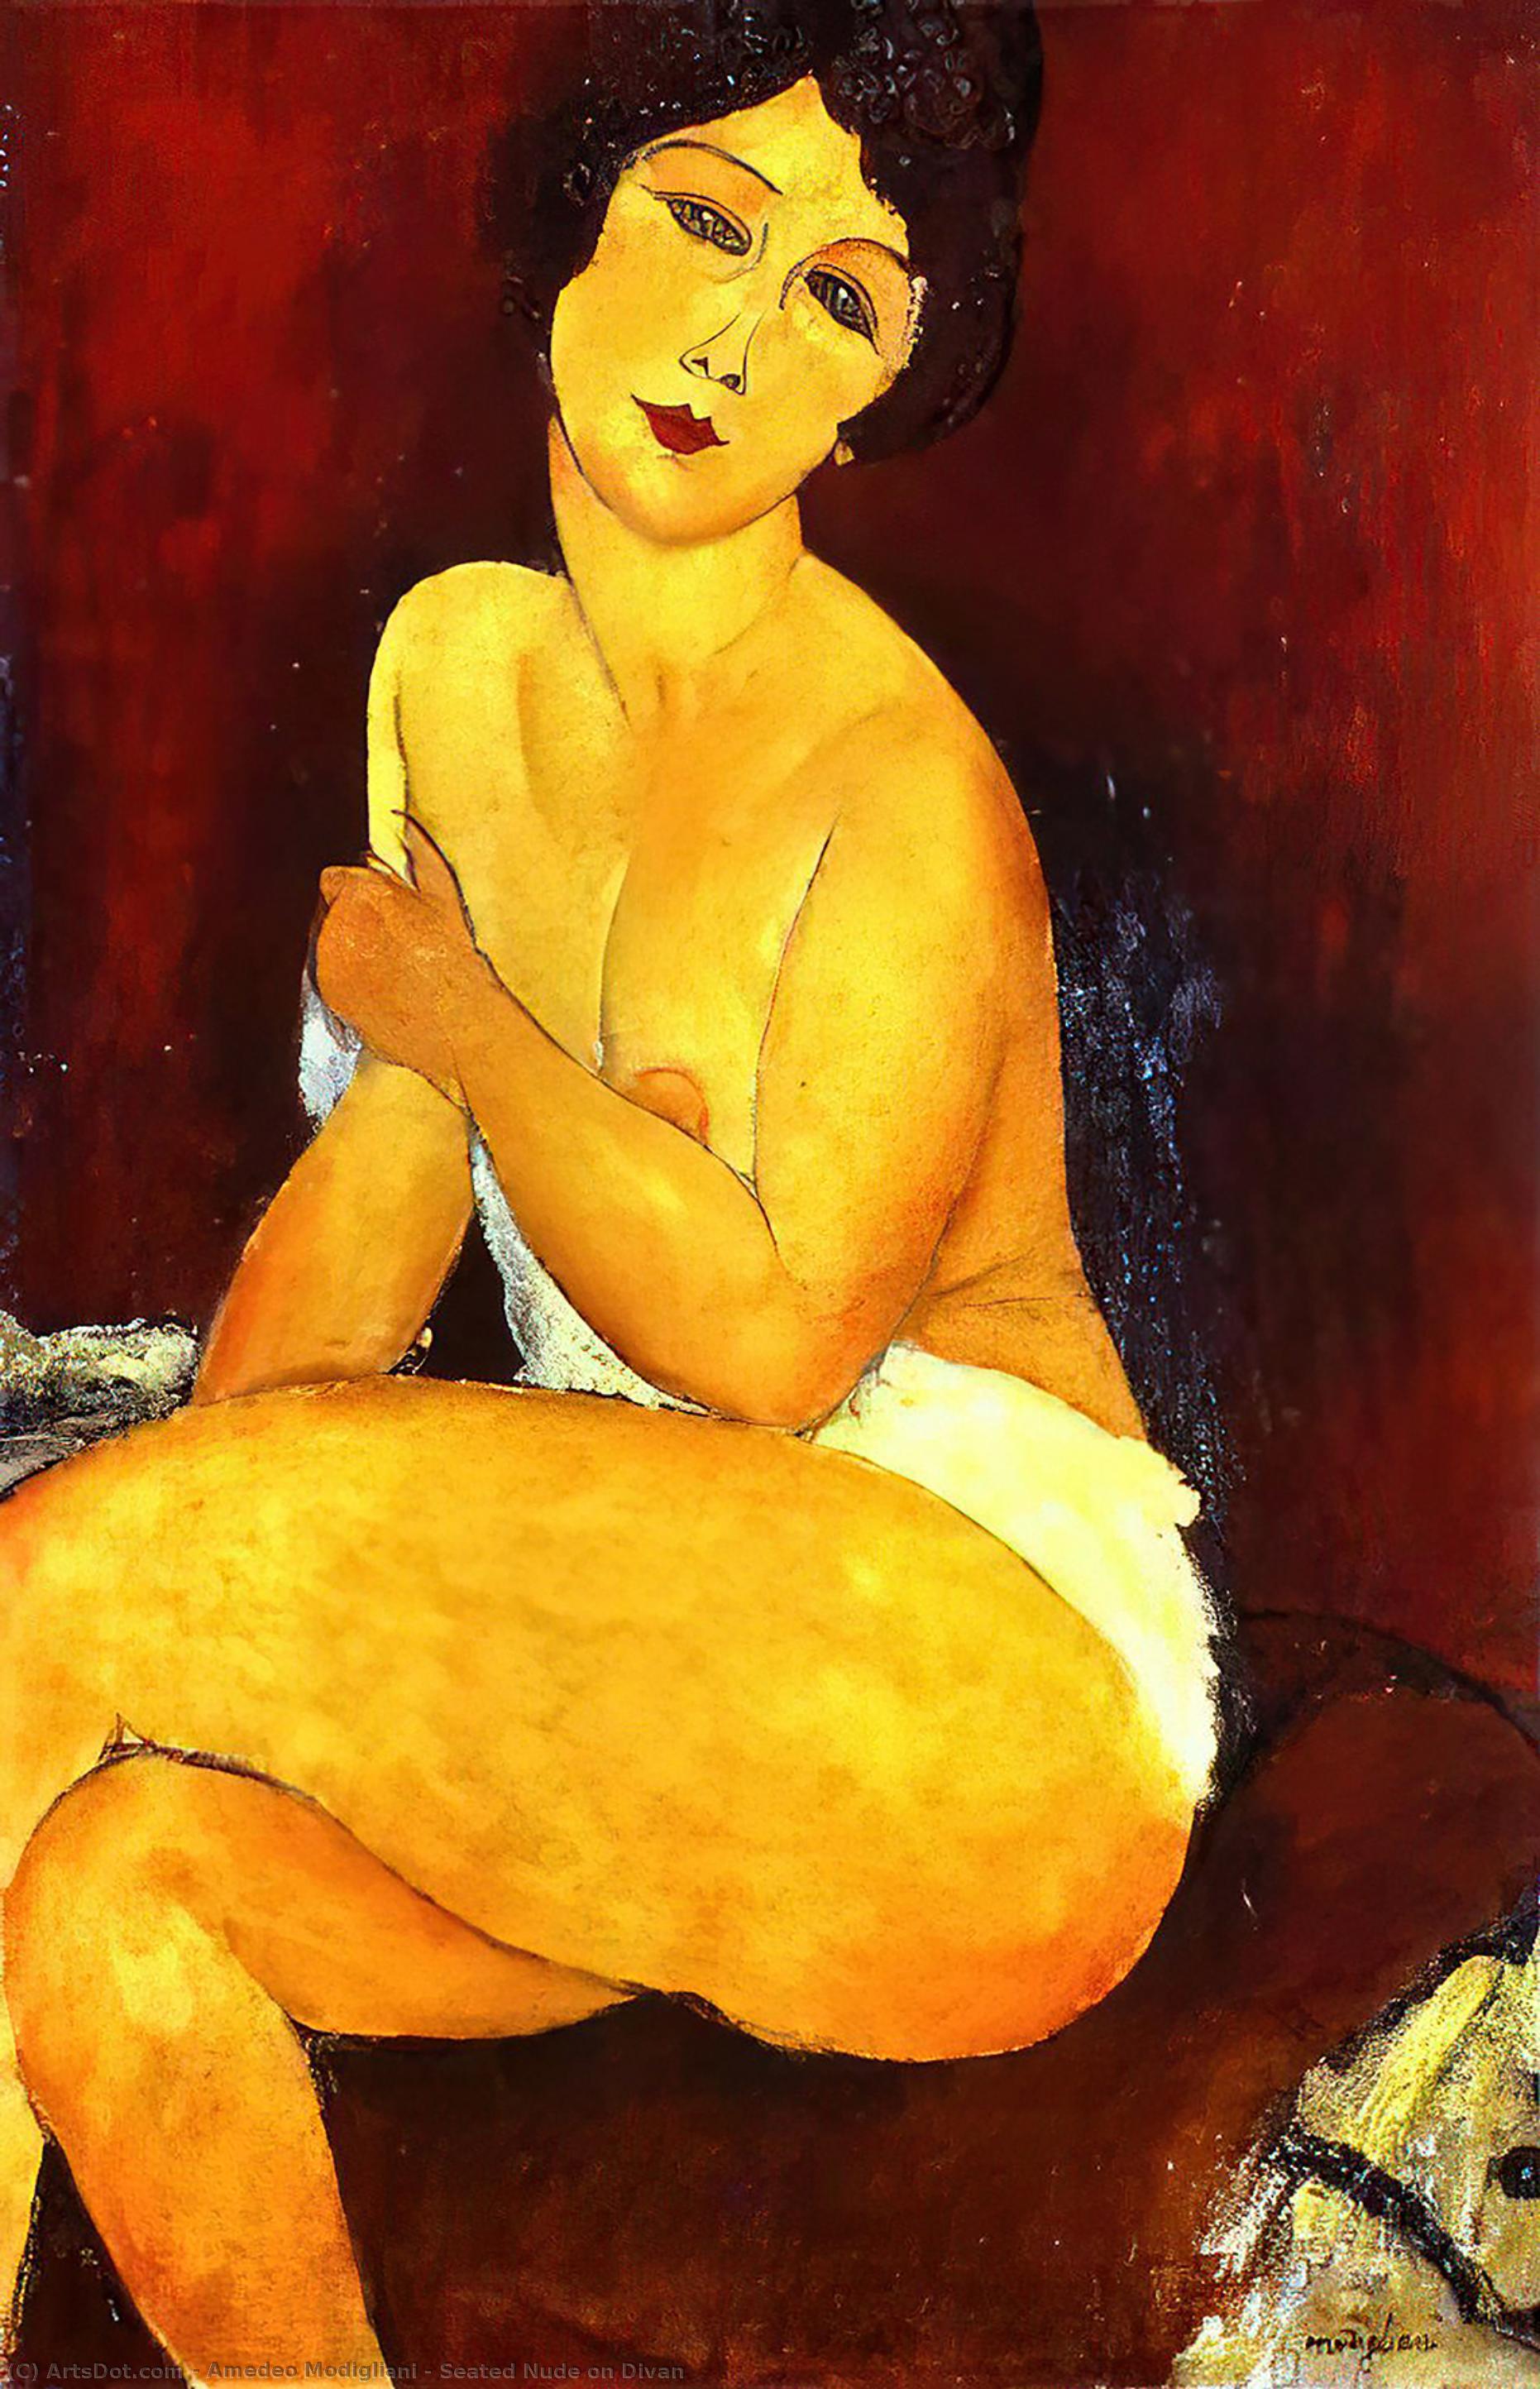 Wikoo.org - موسوعة الفنون الجميلة - اللوحة، العمل الفني Amedeo Modigliani - Seated Nude on Divan